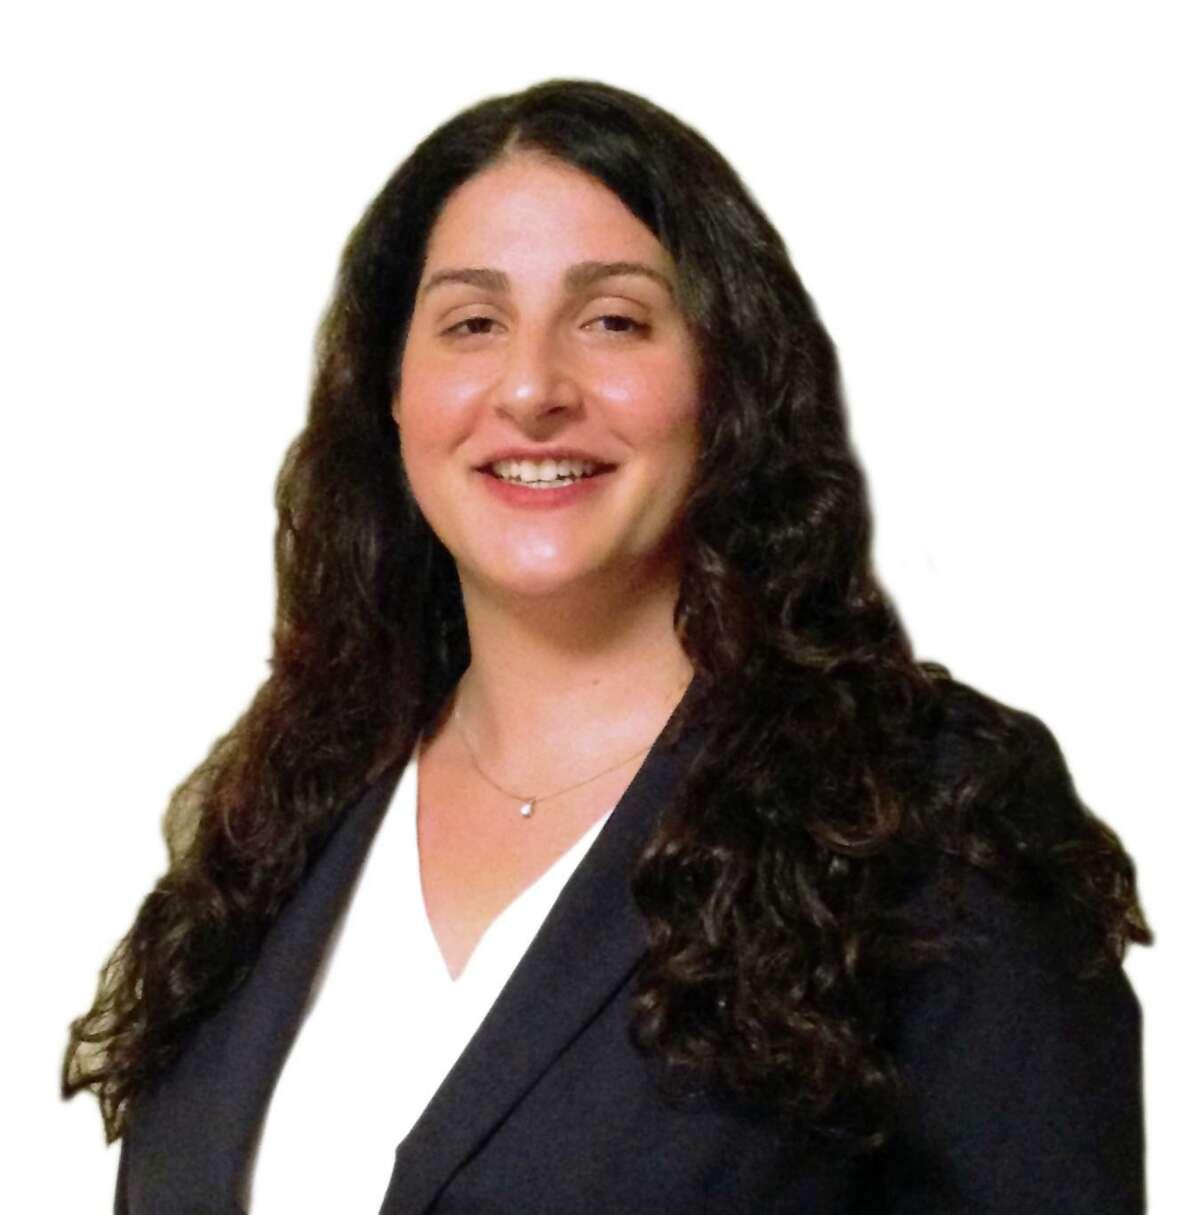 Patrizia Zucaro